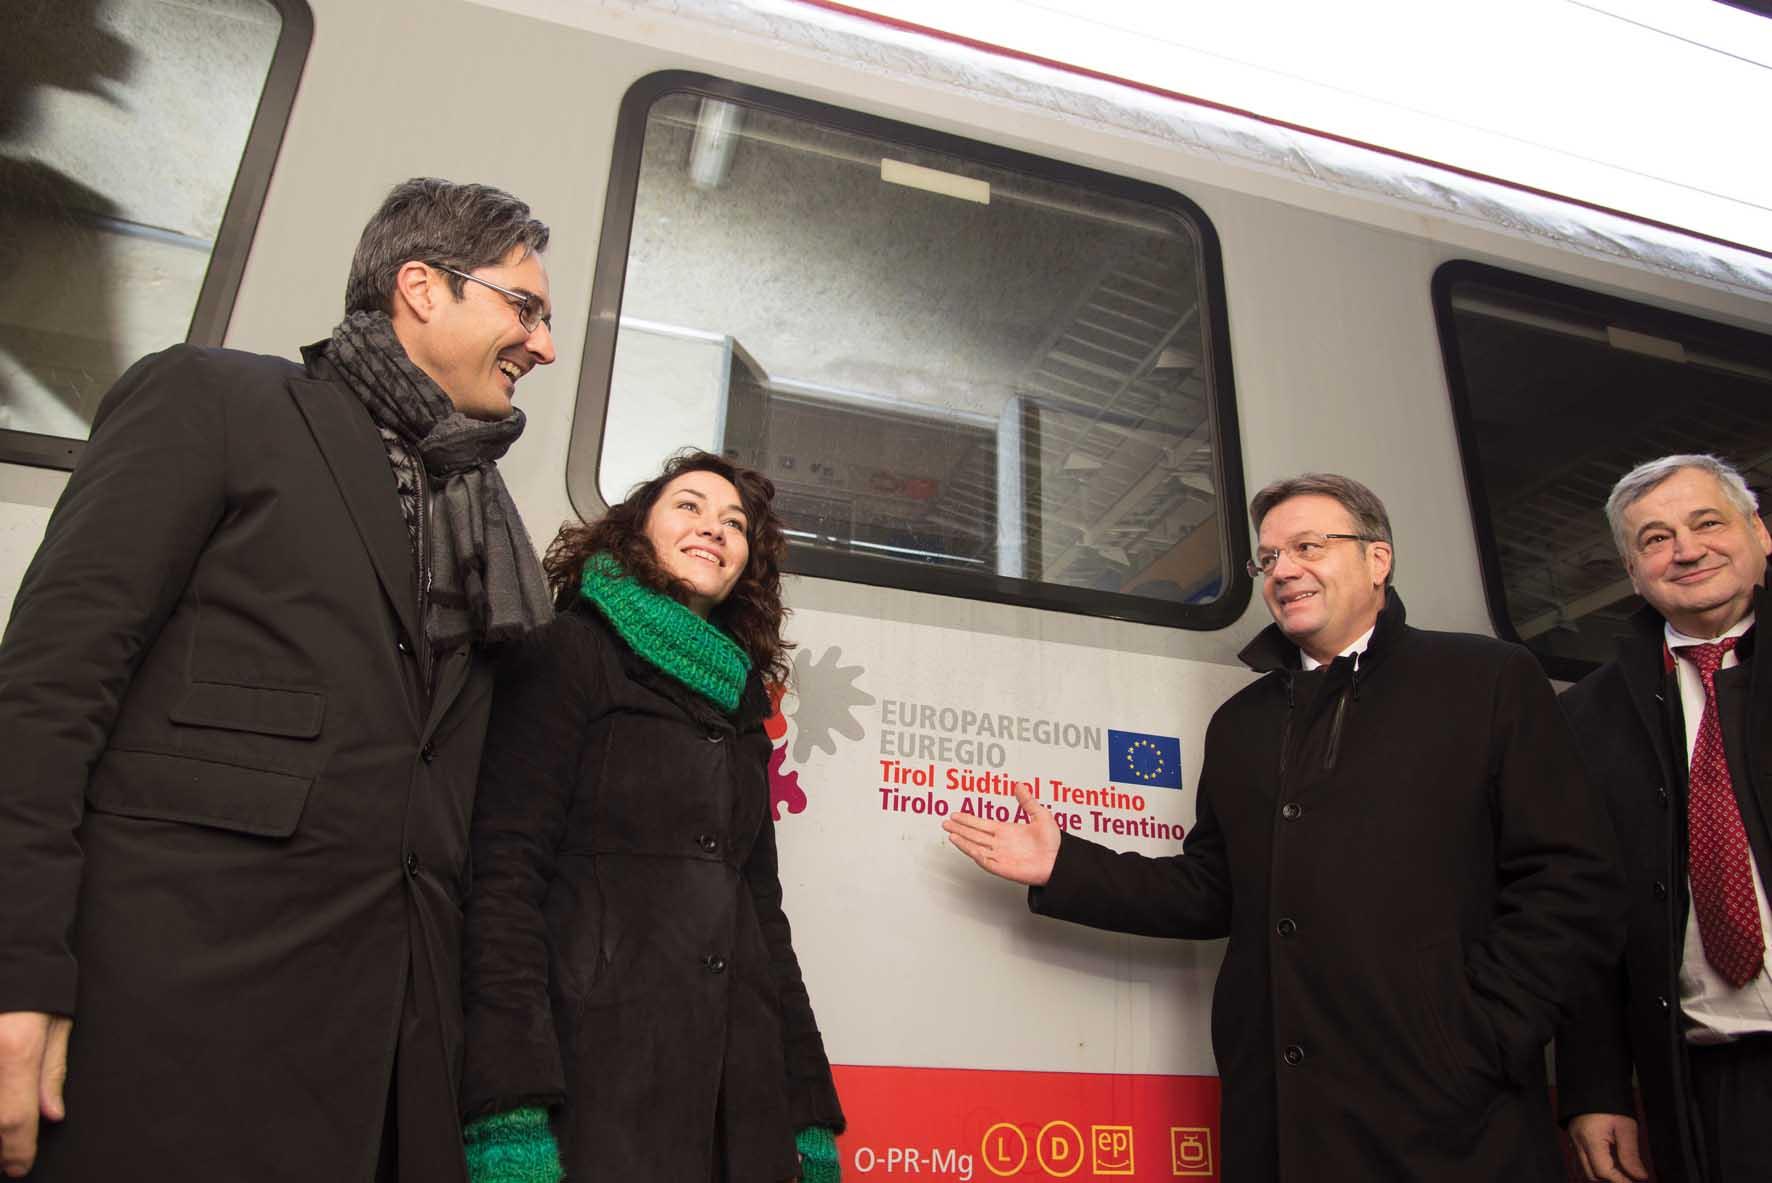 euregio tirolese ferroviaria i presidenti Kompatscher Platter con gli assessori Felipe e Mussner